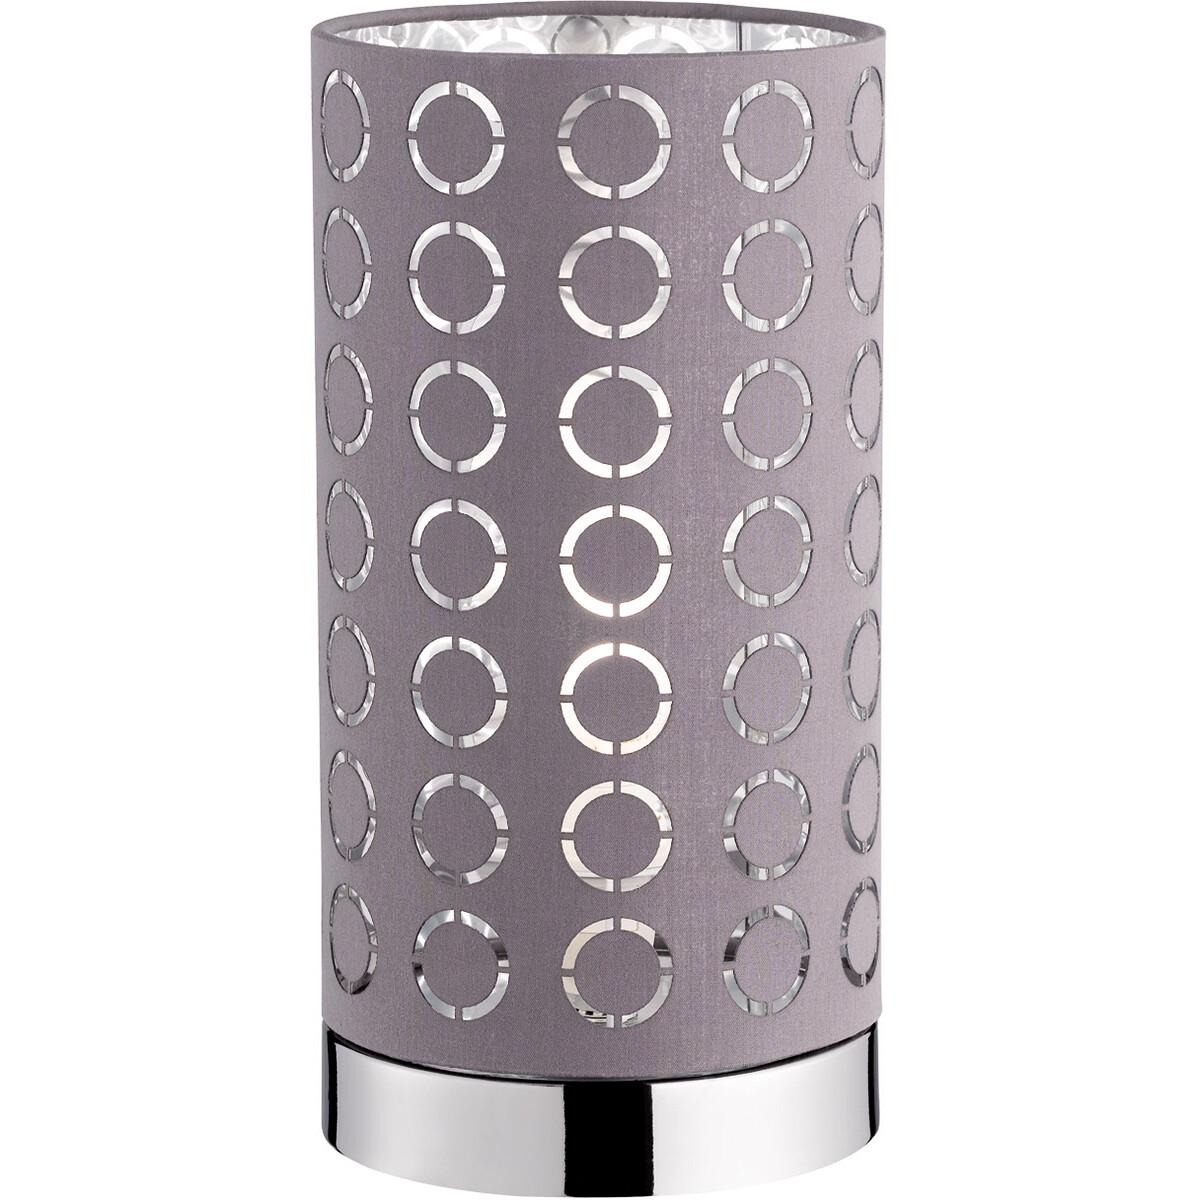 LED Tafellamp - Tafelverlichting - Trion Twiton - E14 Fitting - Rond - Mat Chroom - Aluminium